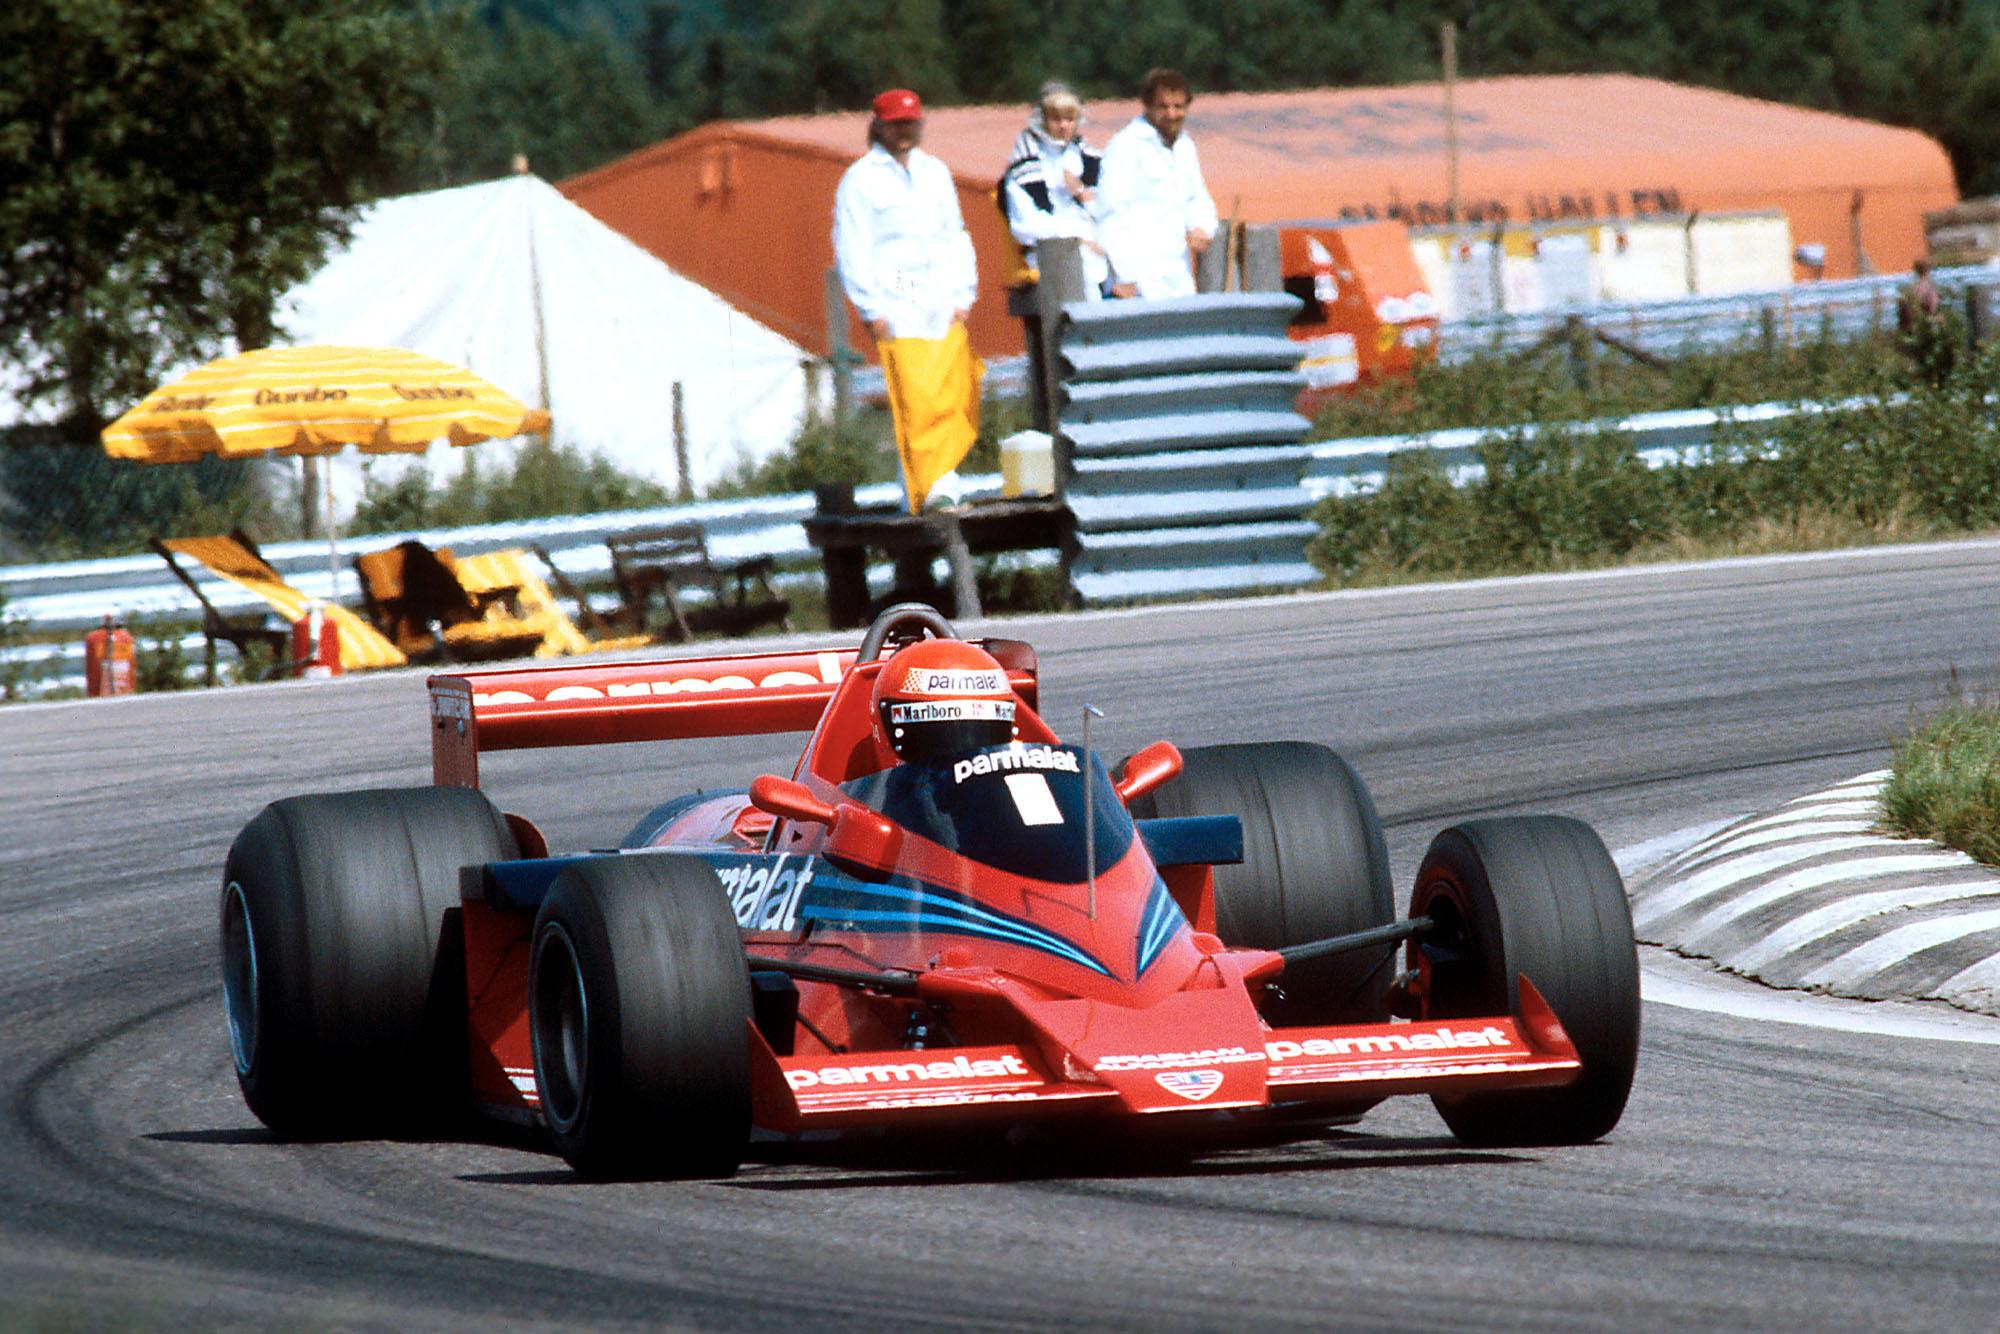 Niki Lauda (Brabham) at the 1978 Swedish Grand Prix, Anderstorp.